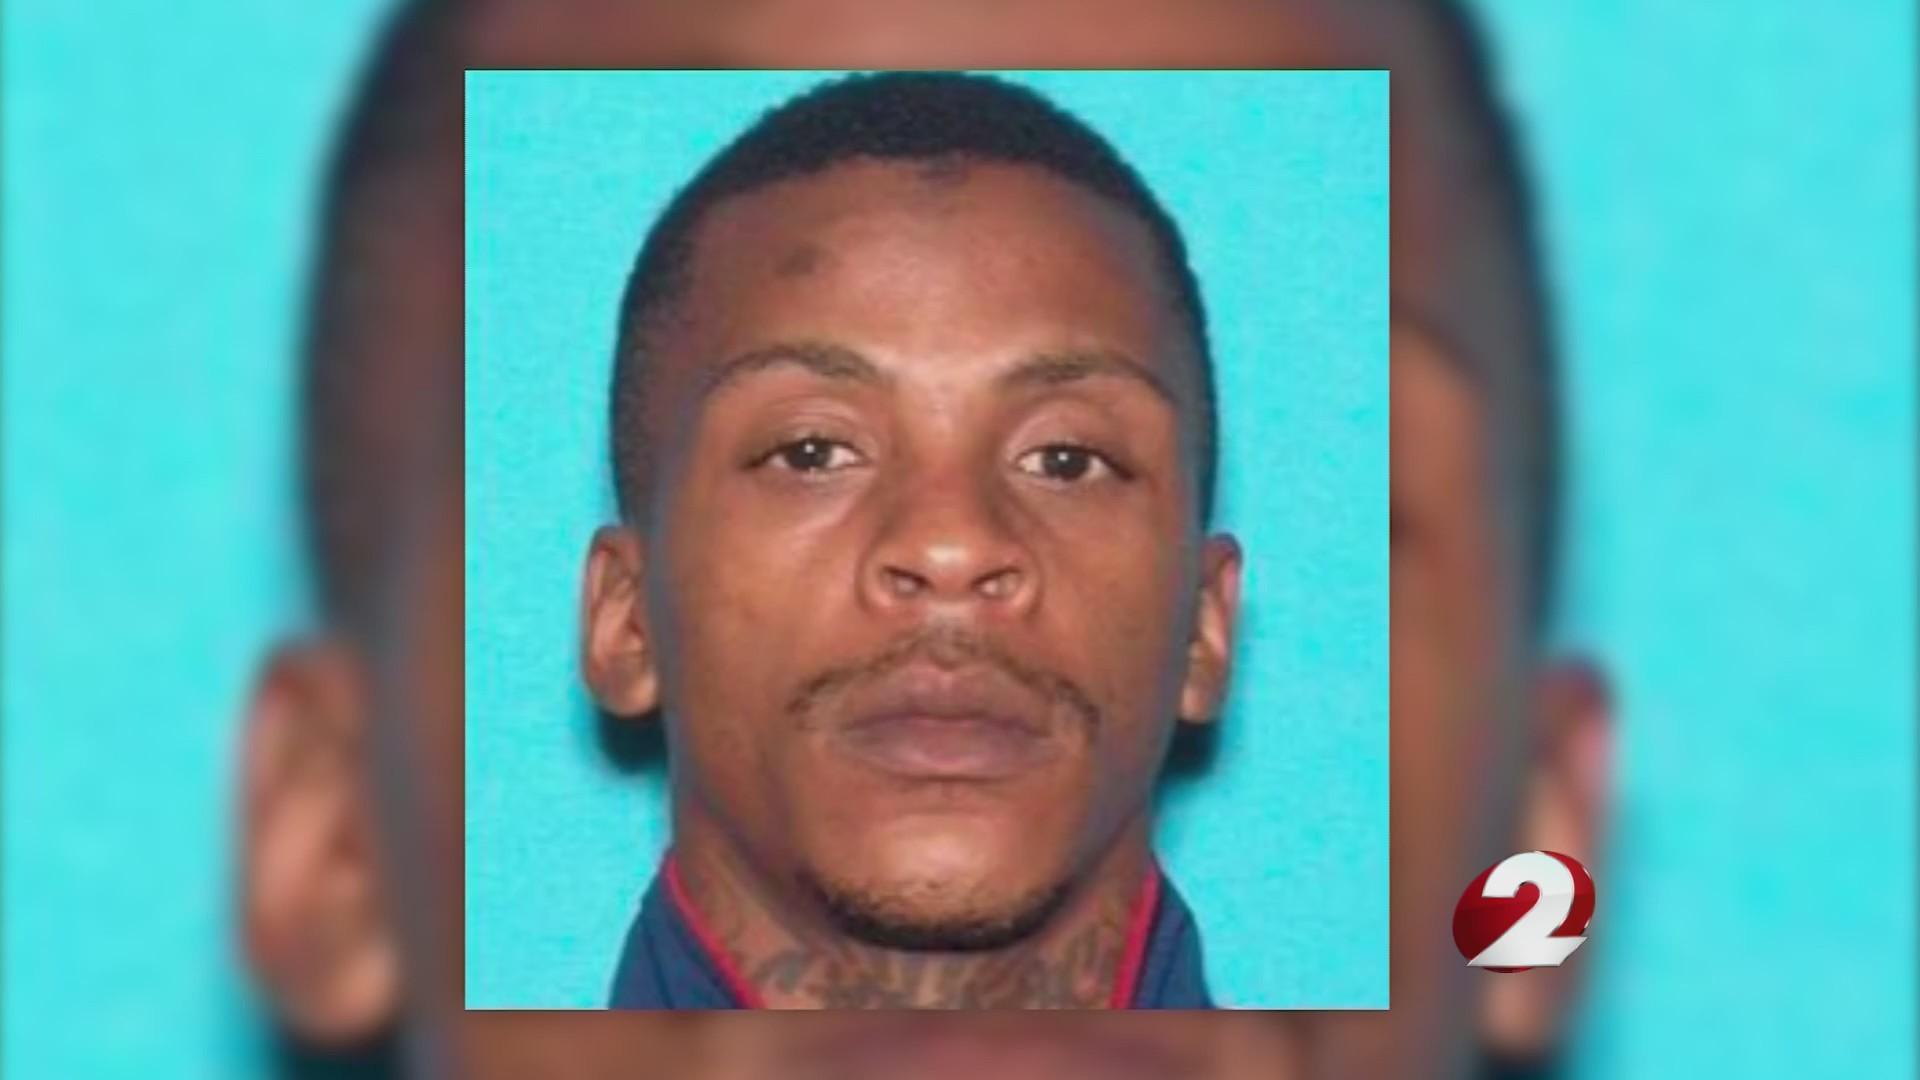 Police identify suspect in murder of rapper Nipsey Hussle